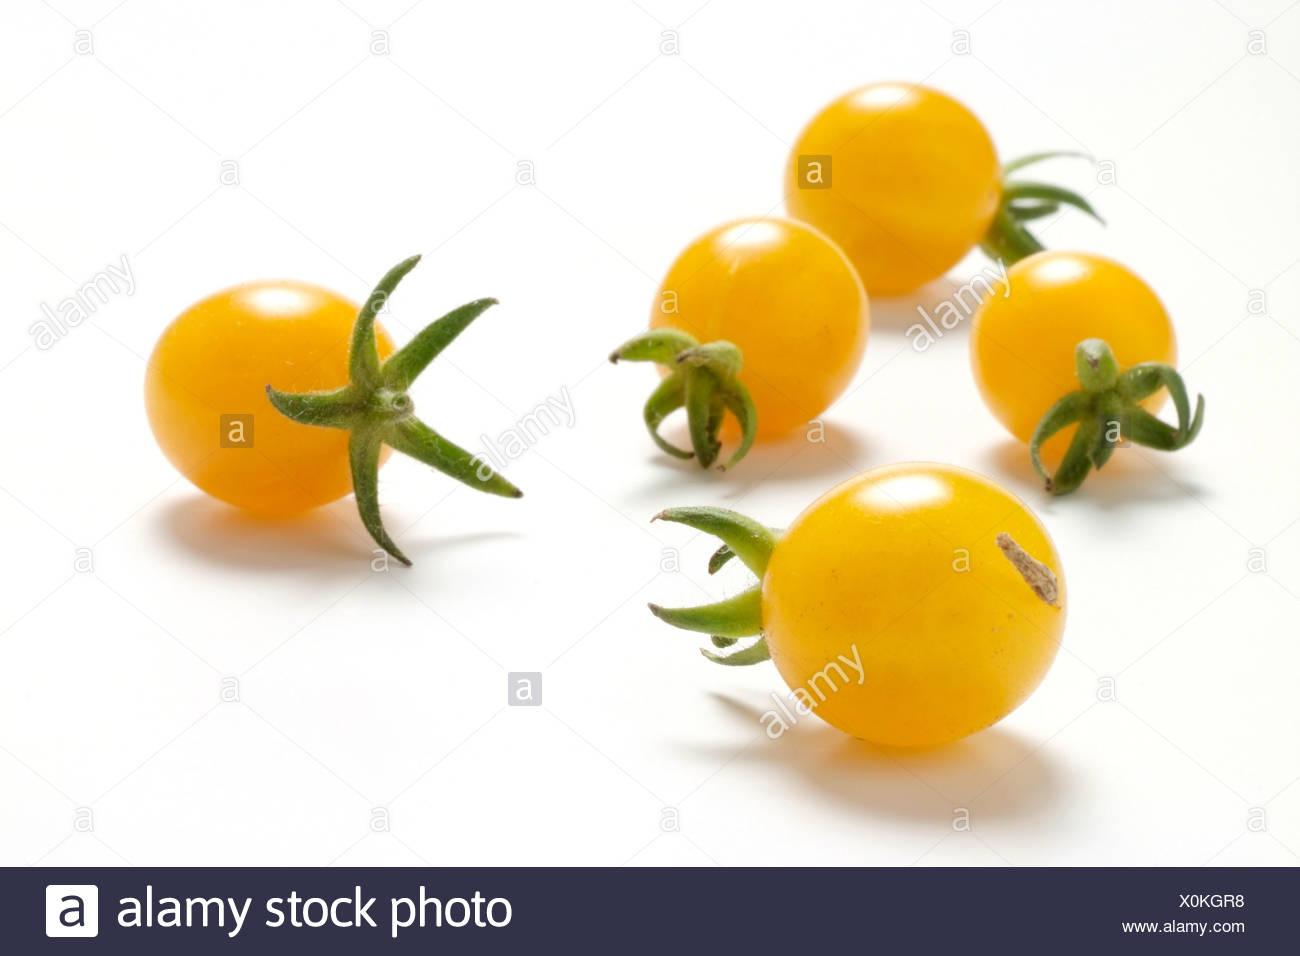 Tomato varieties: yellow cherry tomato - Stock Image